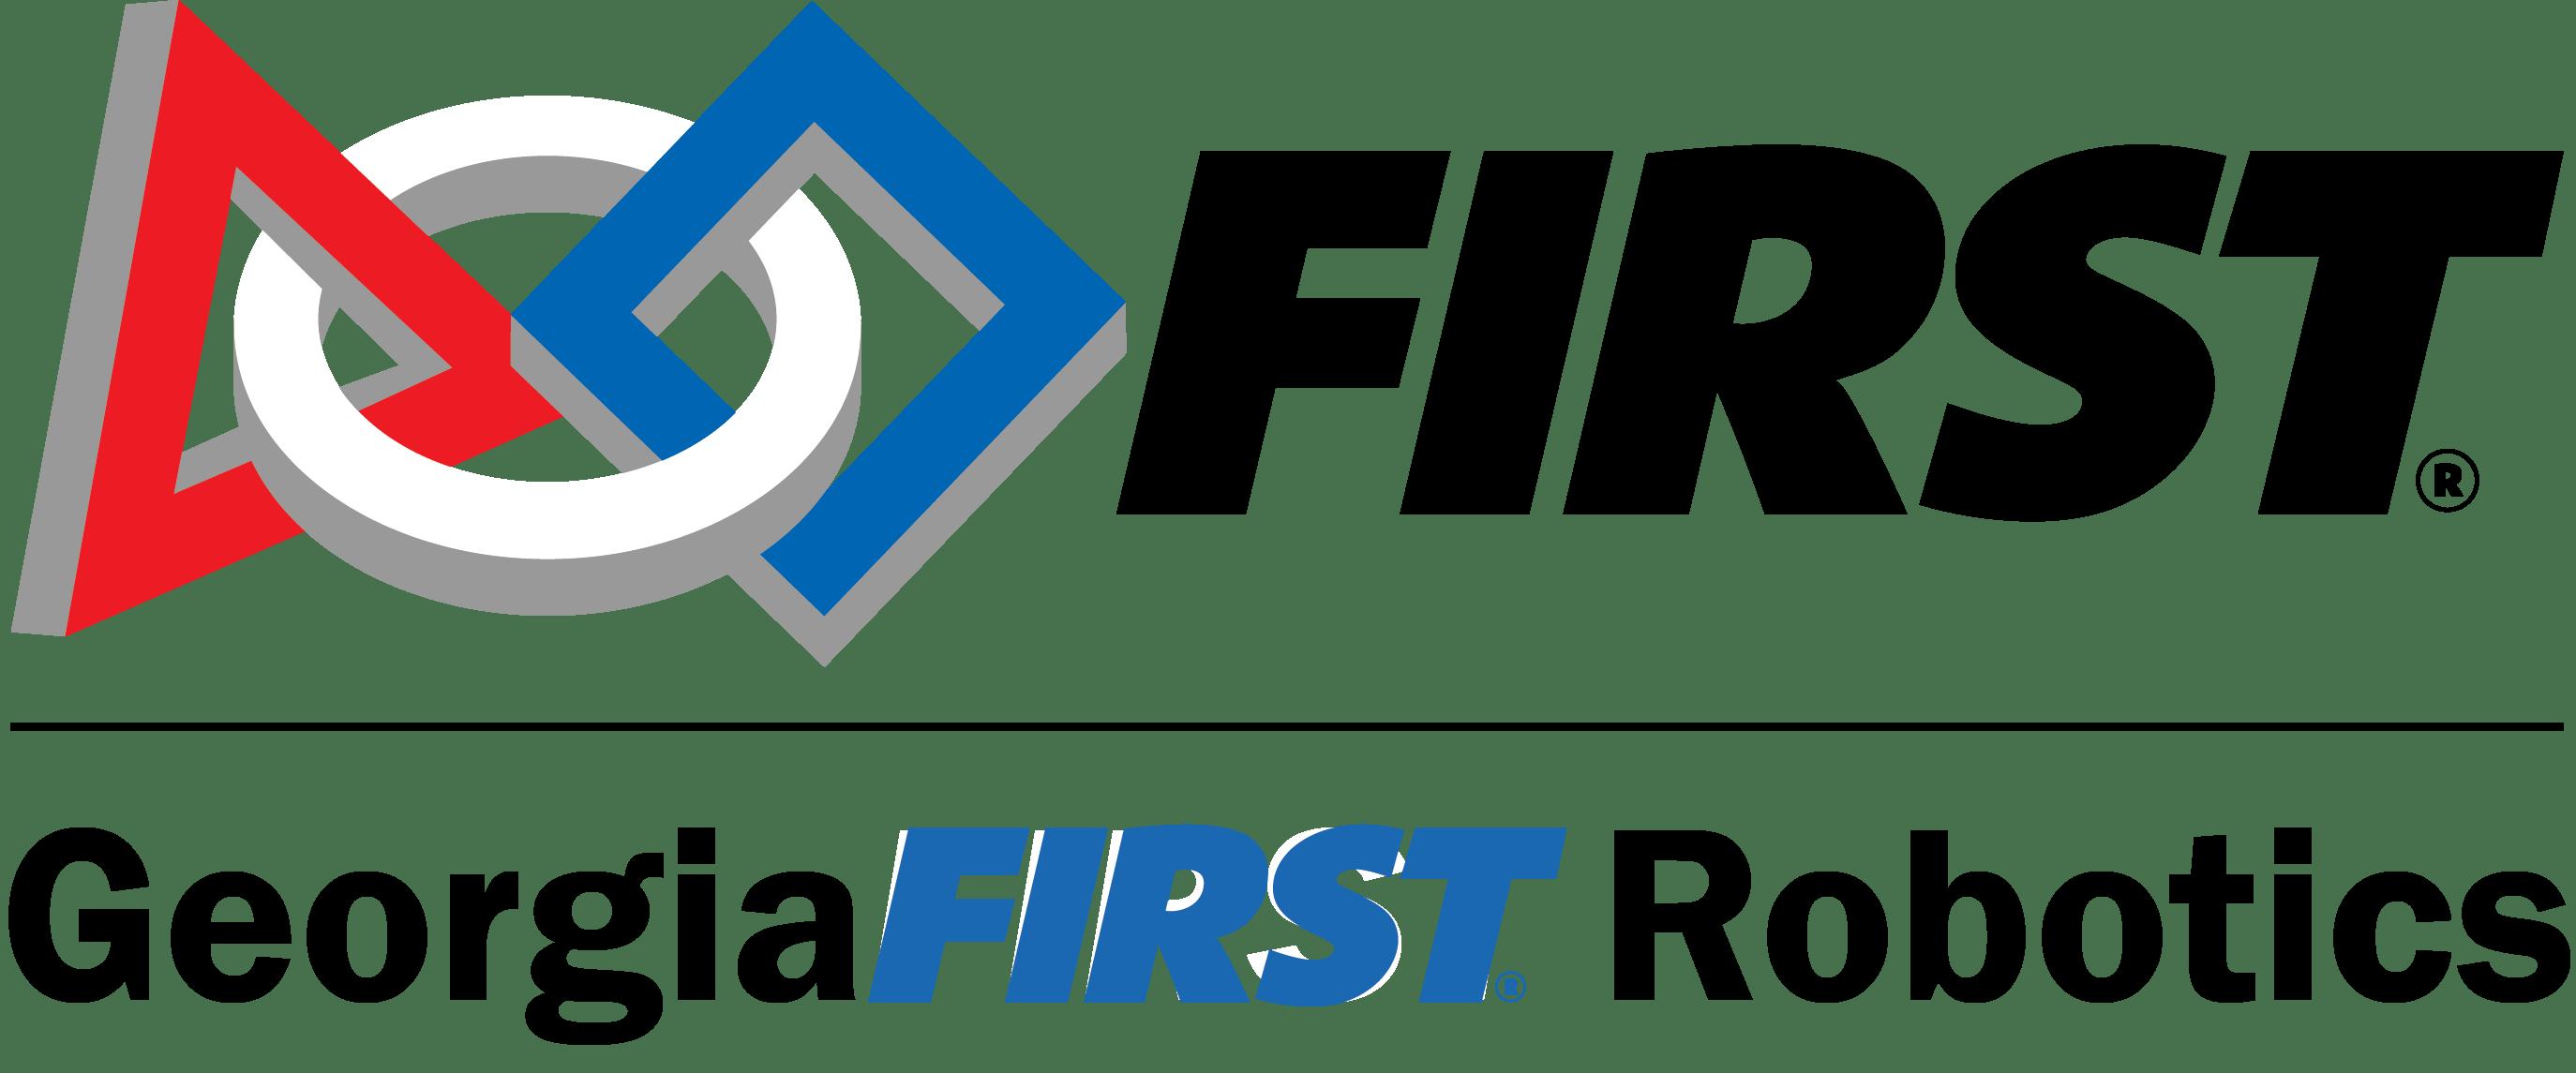 Georgia First Robotics First Robotics In Georgia